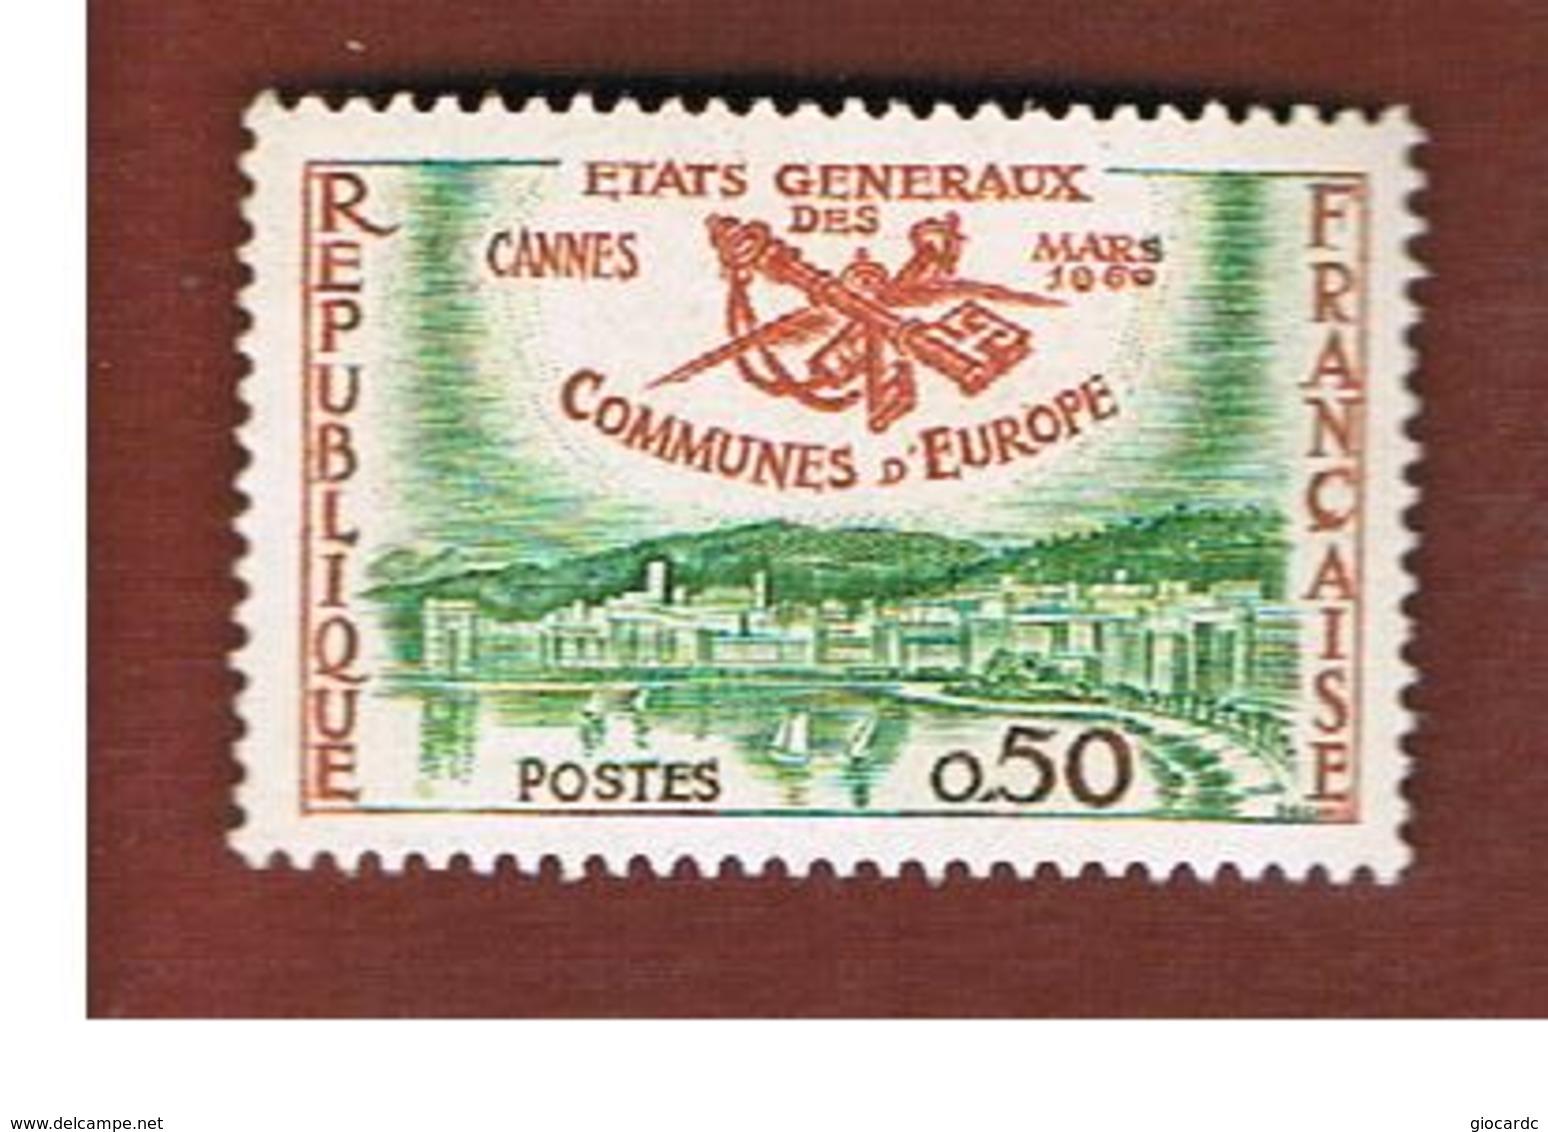 FRANCIA  (FRANCE)      -  SG  1474  -   1960 SUMMIT EUROPEAN MEYORS   - MINT ** - Ungebraucht